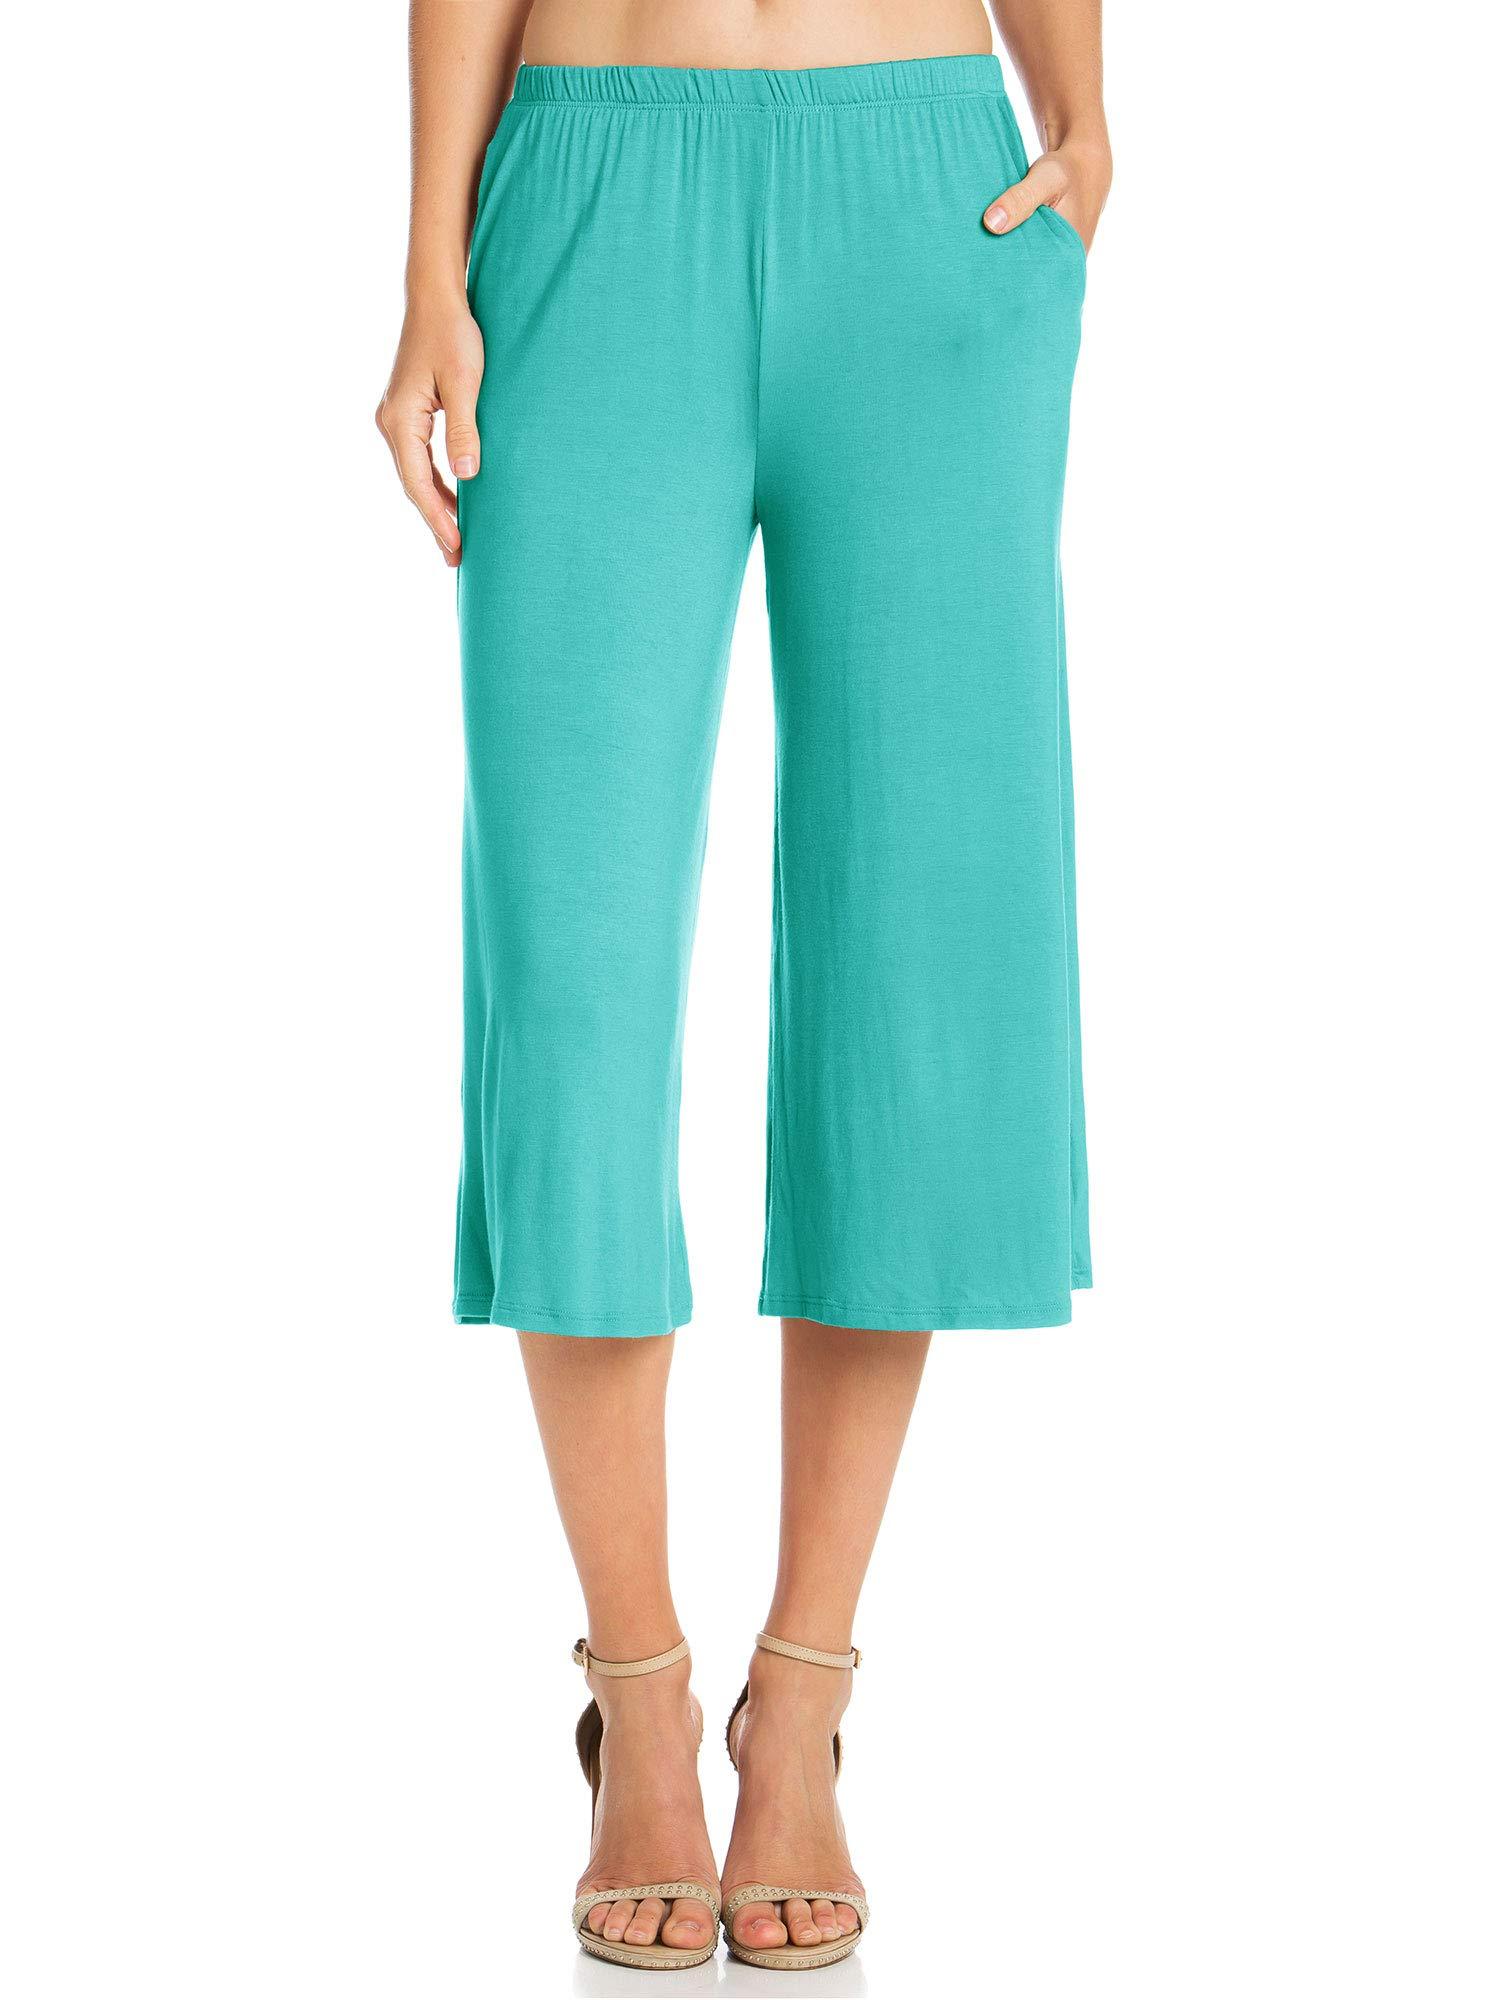 Fashion California Womens 1 Pack Elastic Waist Jersey Culottes Capri Pocket Pants (XXXXX-Large, Aqua) by Fashion California (Image #2)